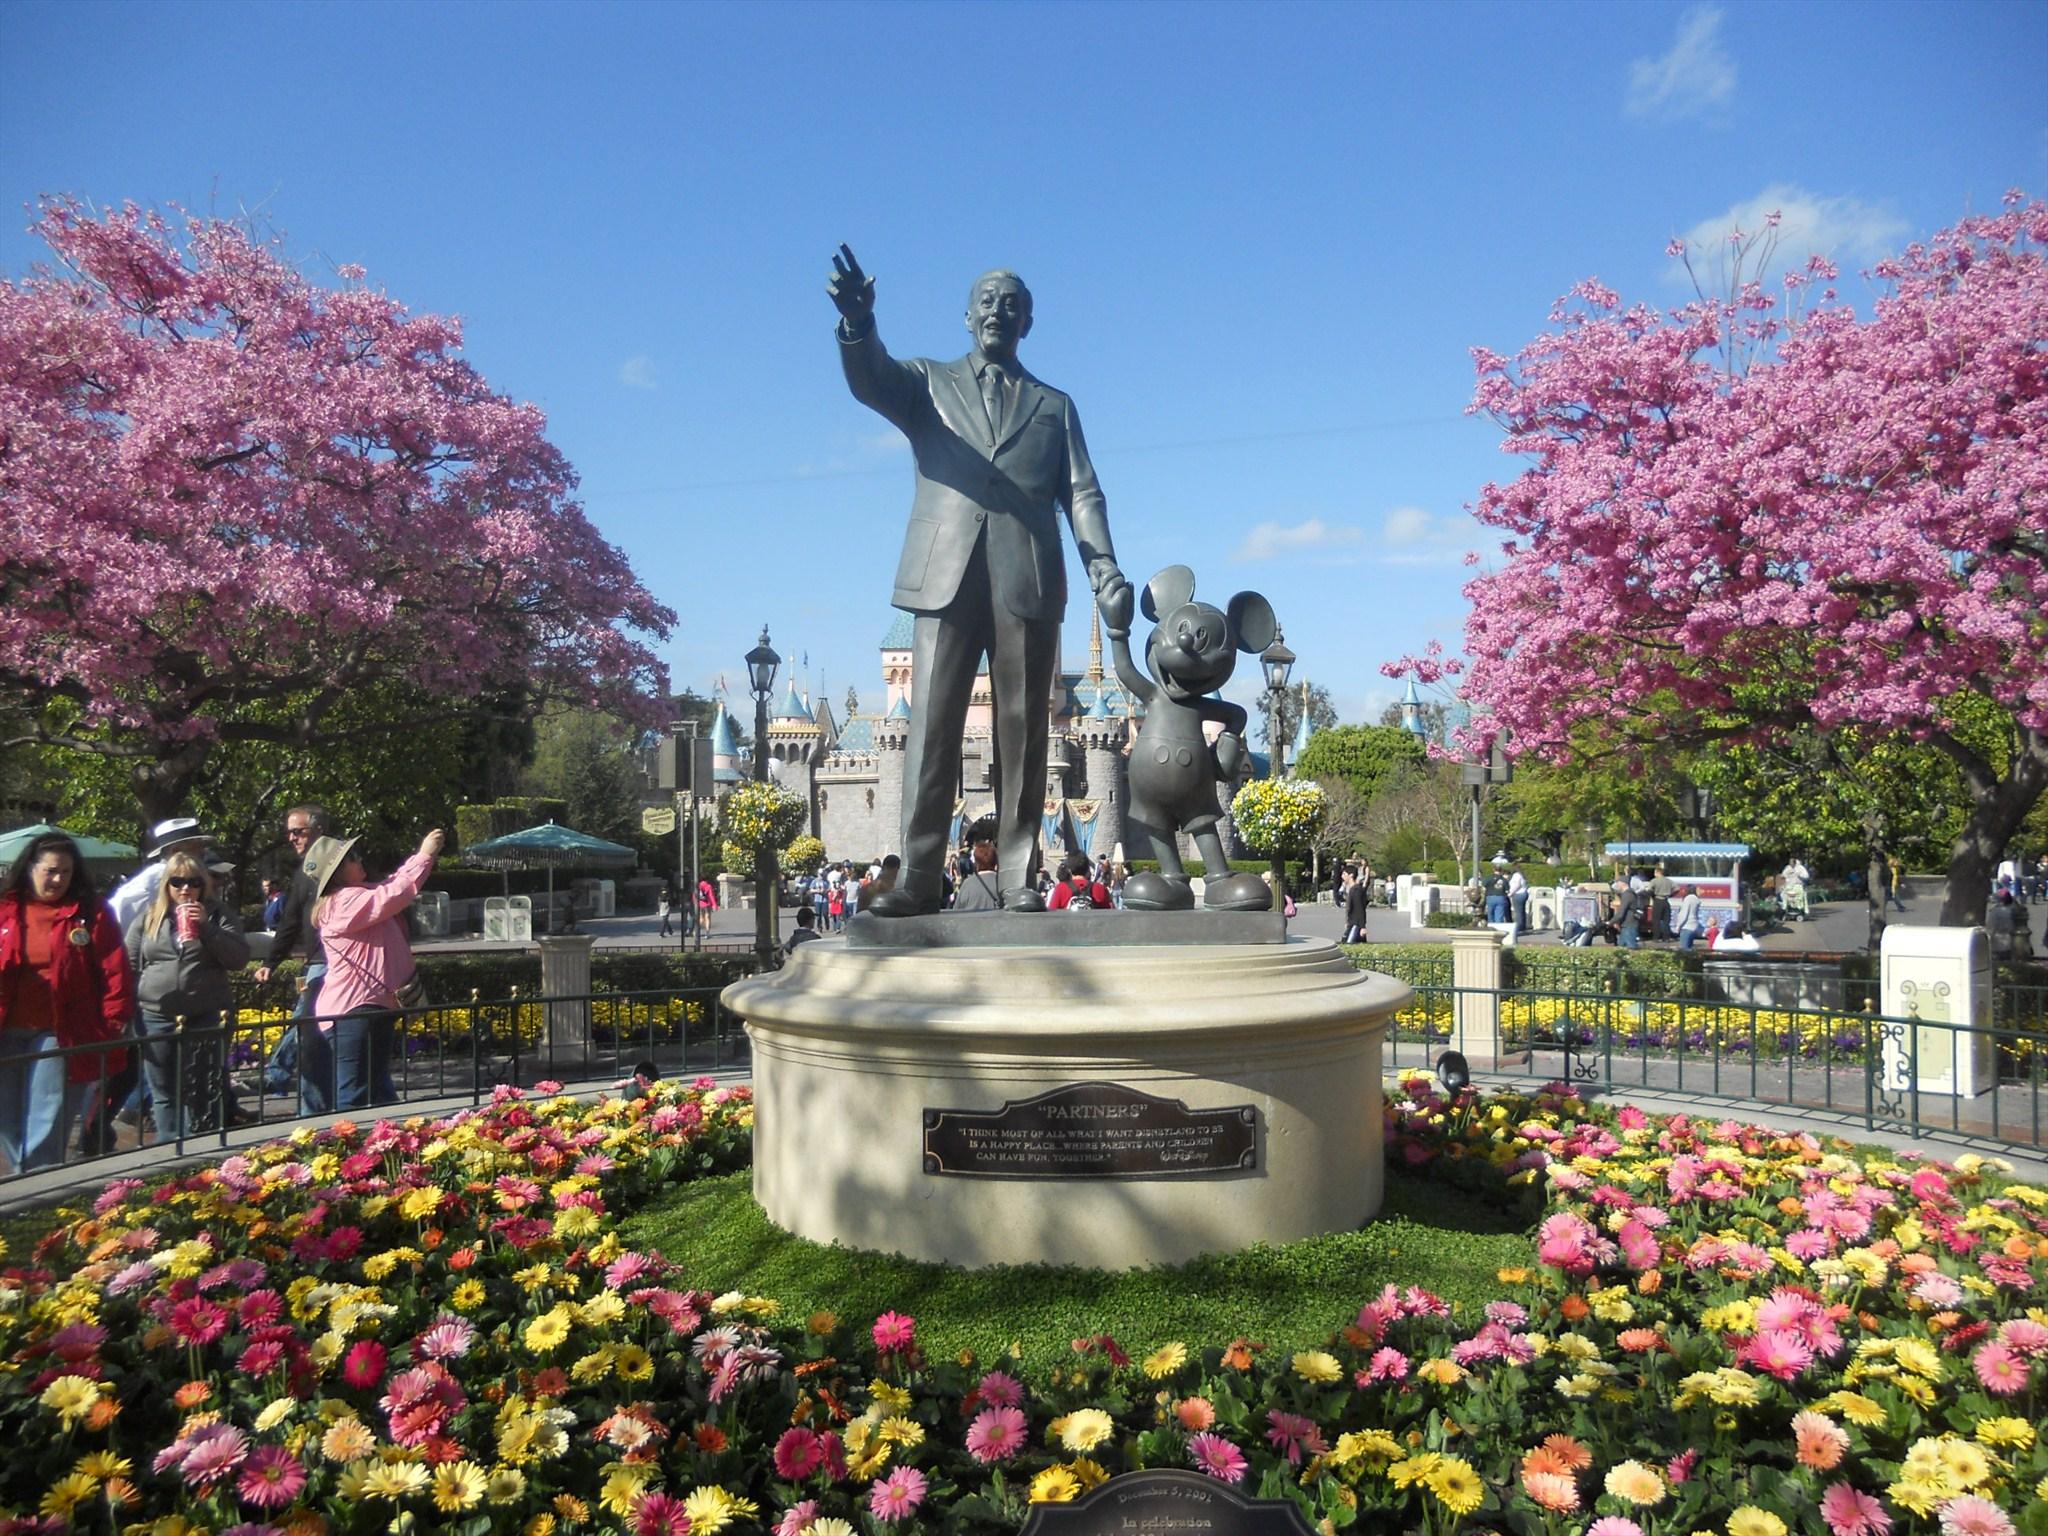 Partners Statue Depicting Walt Disney Mickey